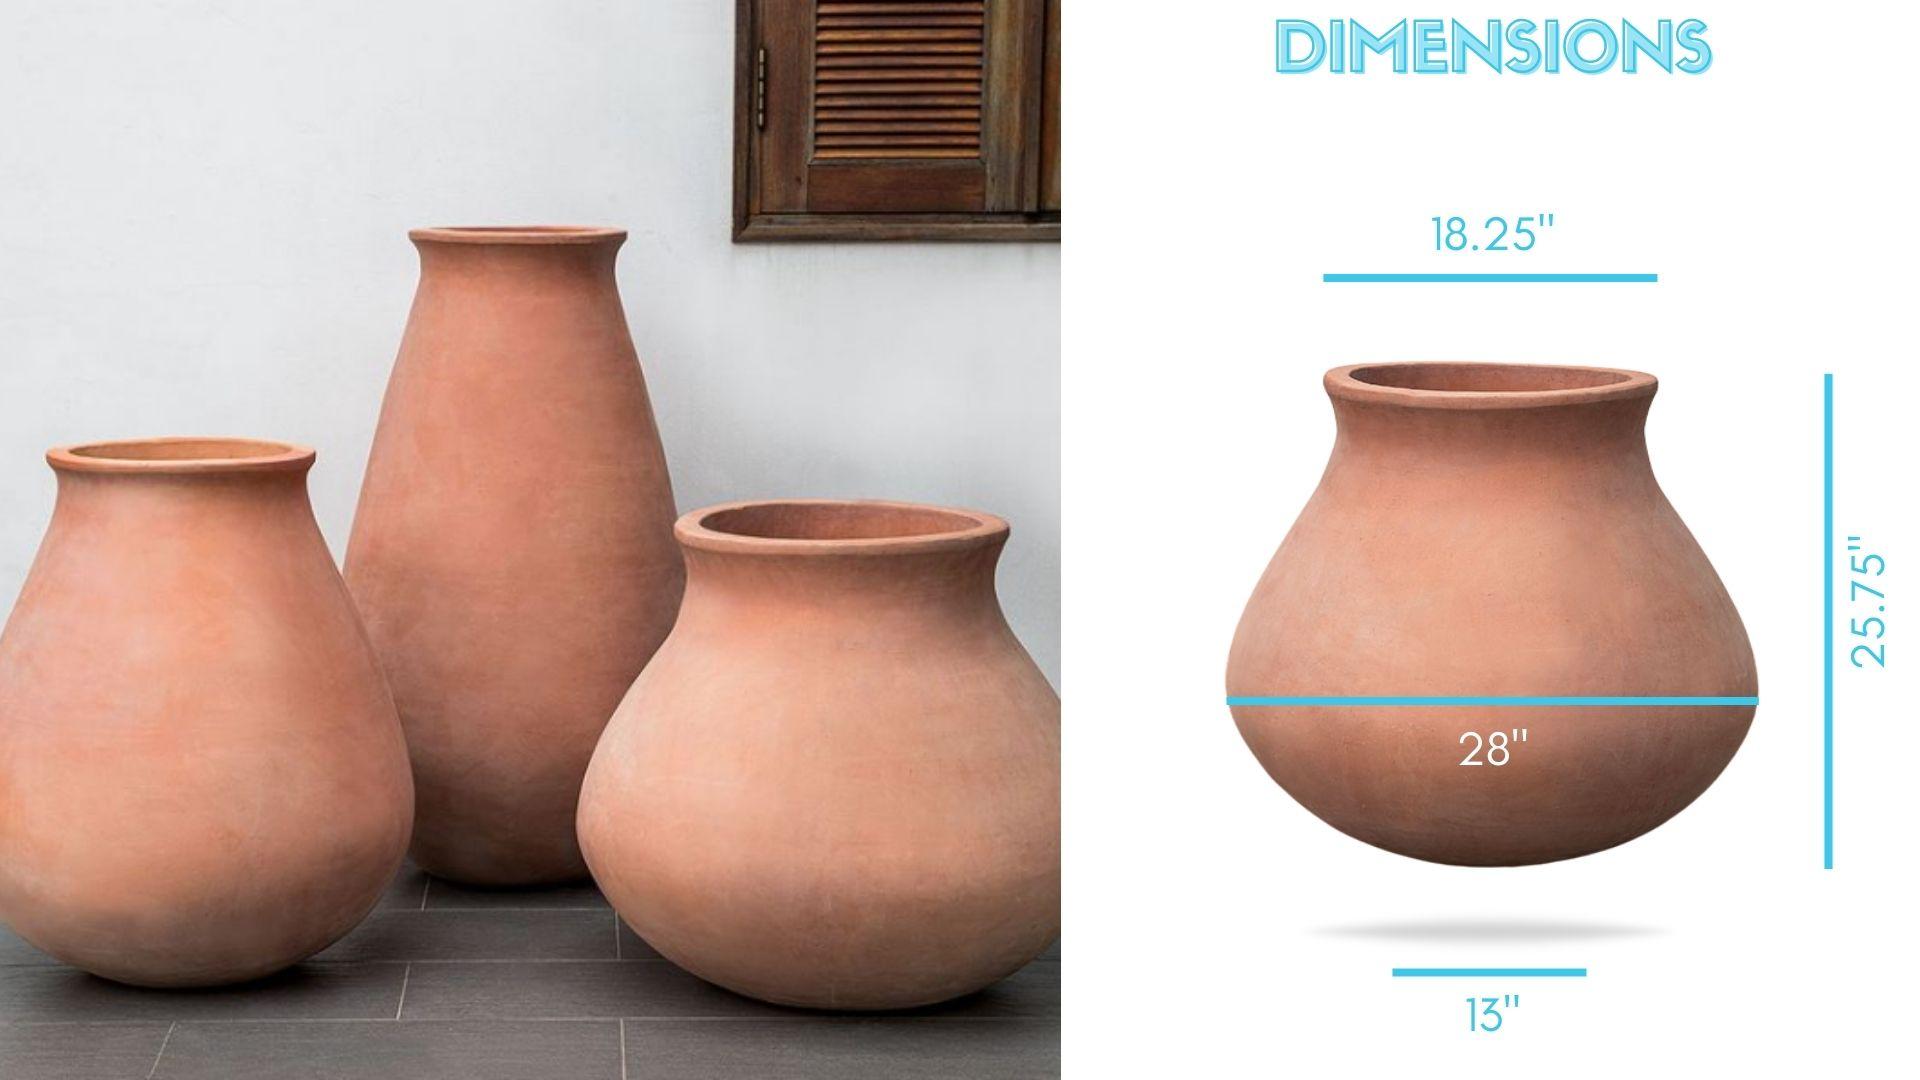 venasque-jar-dimensions planter terracotta